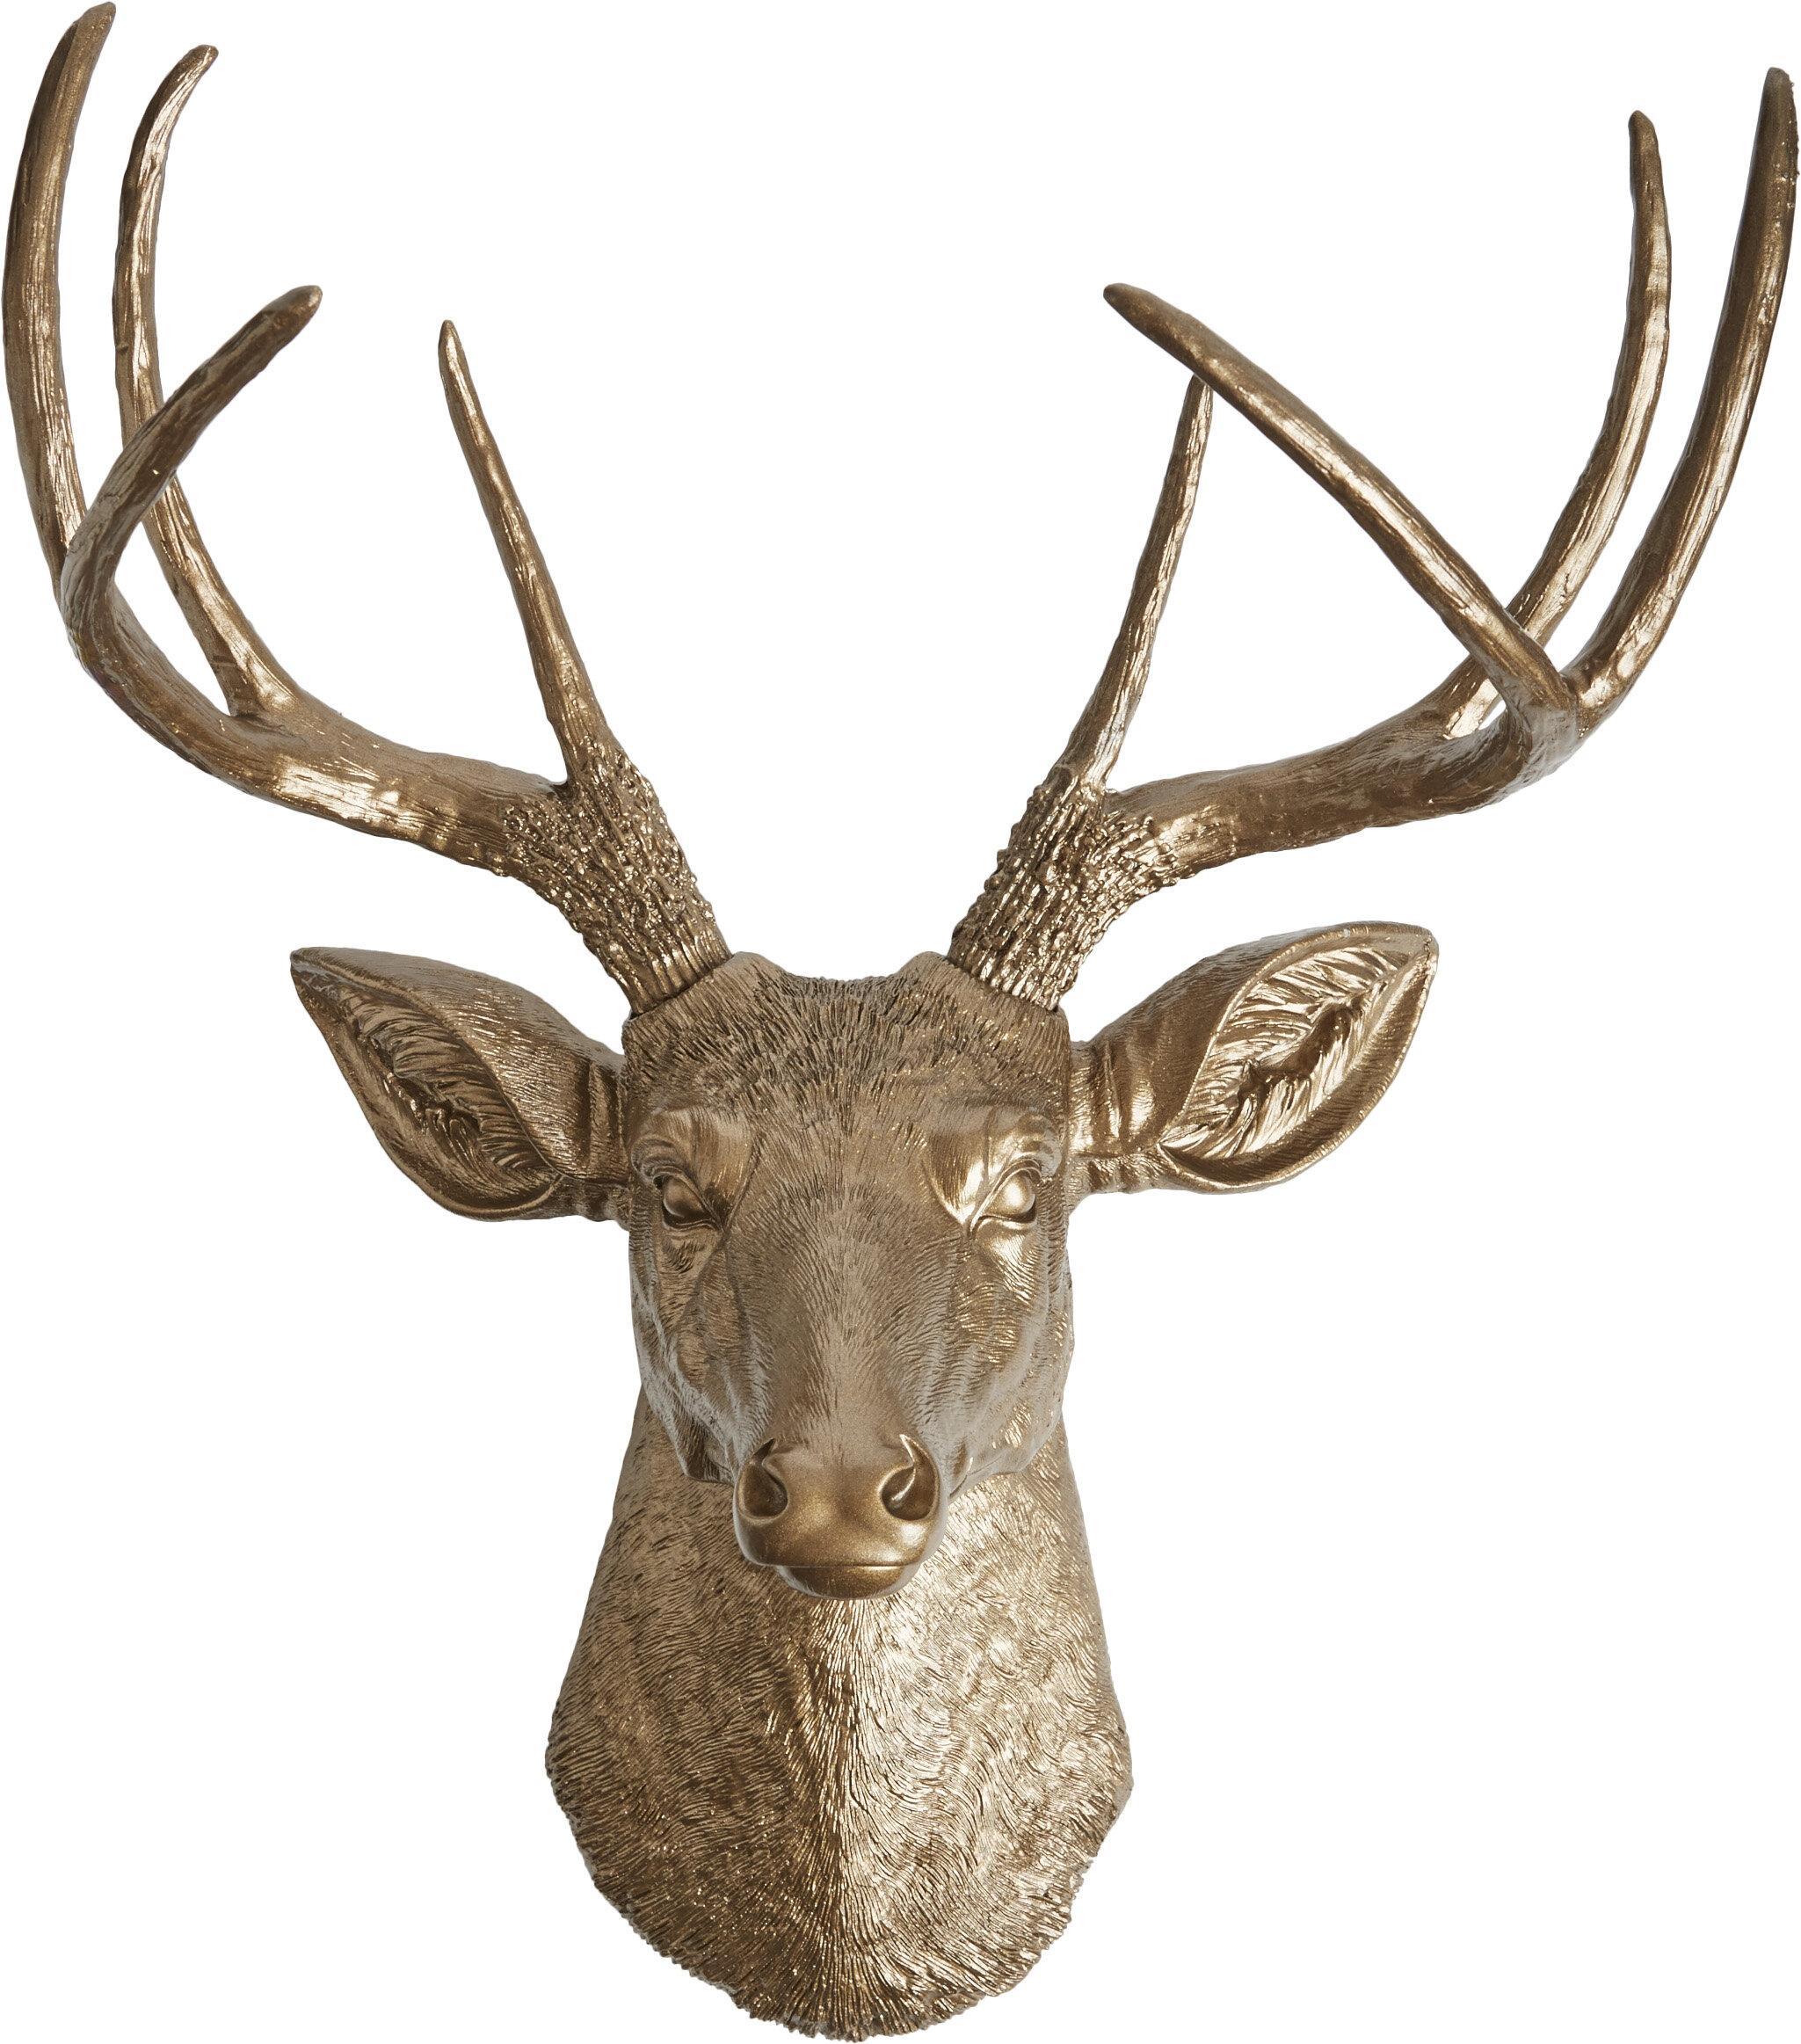 Deer Head Wall Art Part - 20: White Faux Taxidermy The Frankfurt Deer Head Wall Décor u0026 Reviews | Wayfair